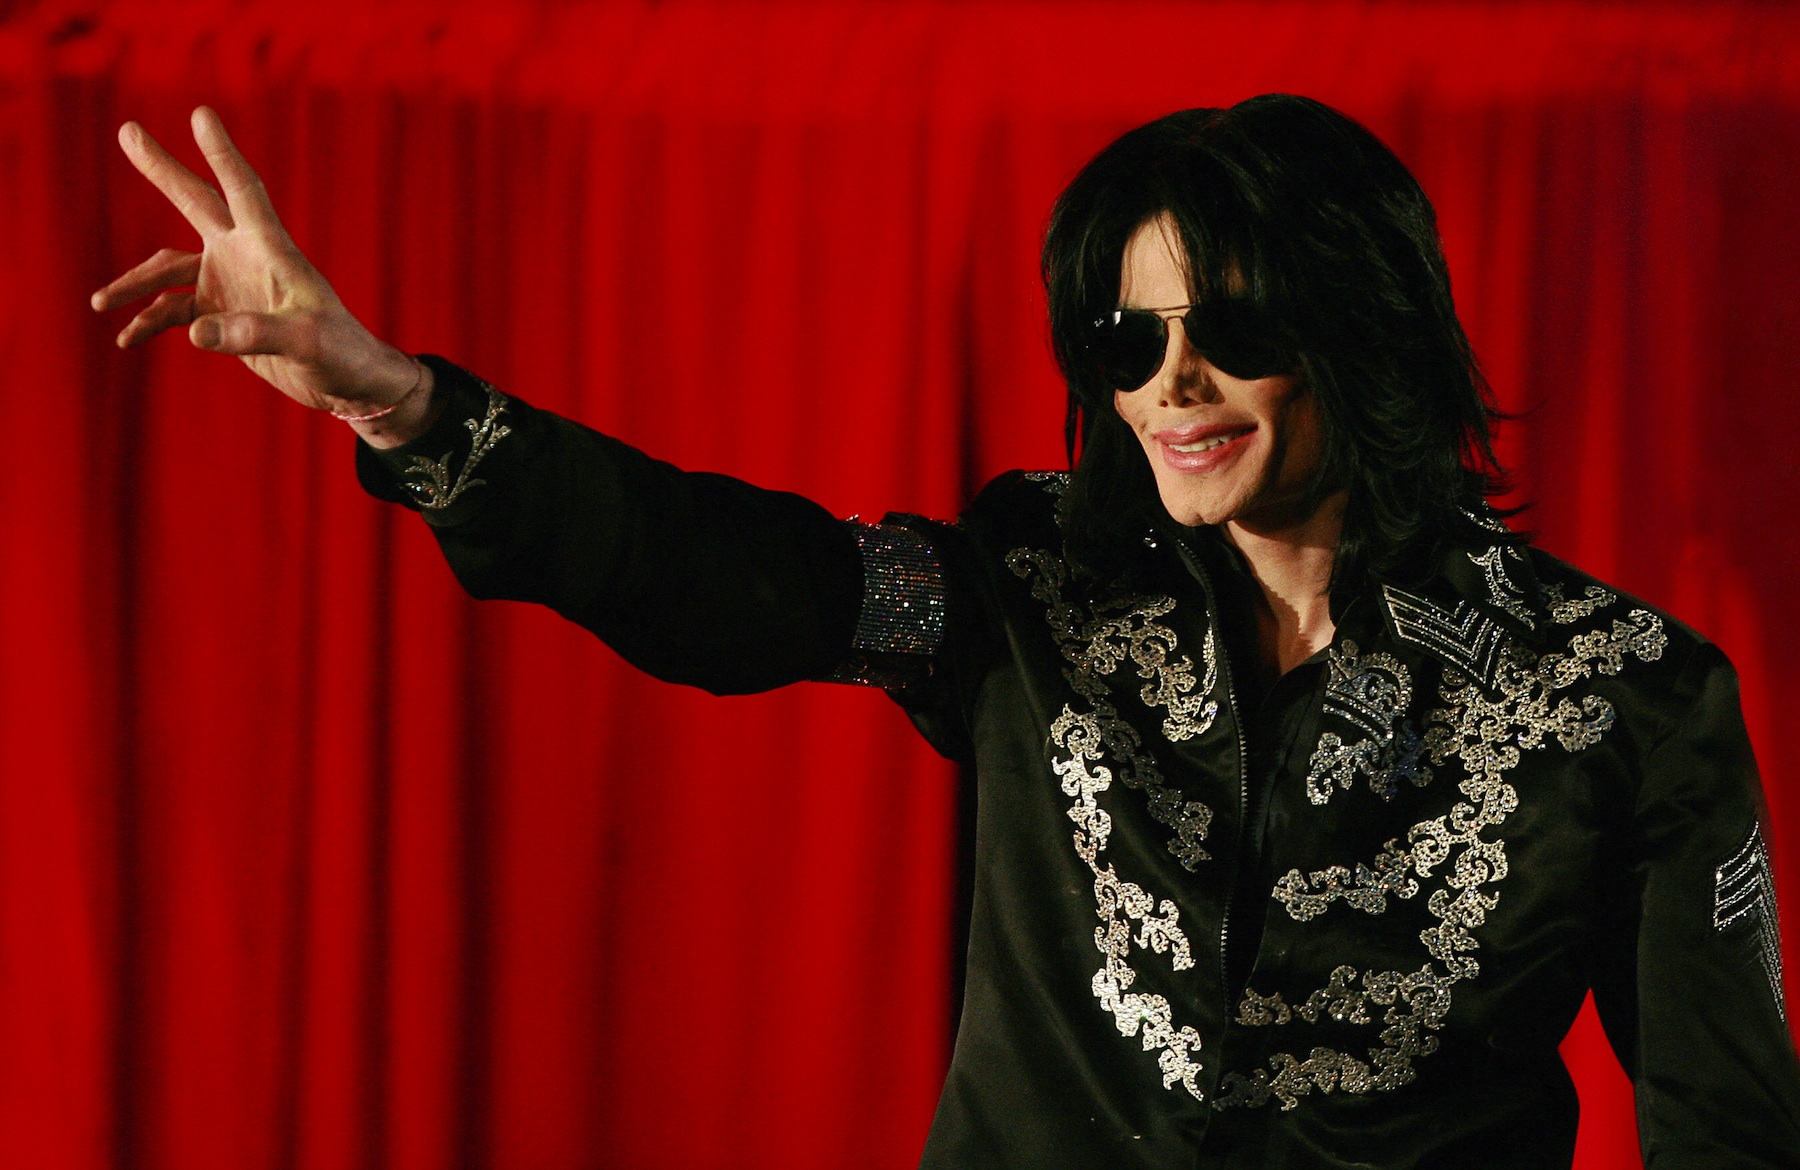 'Private' Michael Jackson Footage Sets off Lawsuit